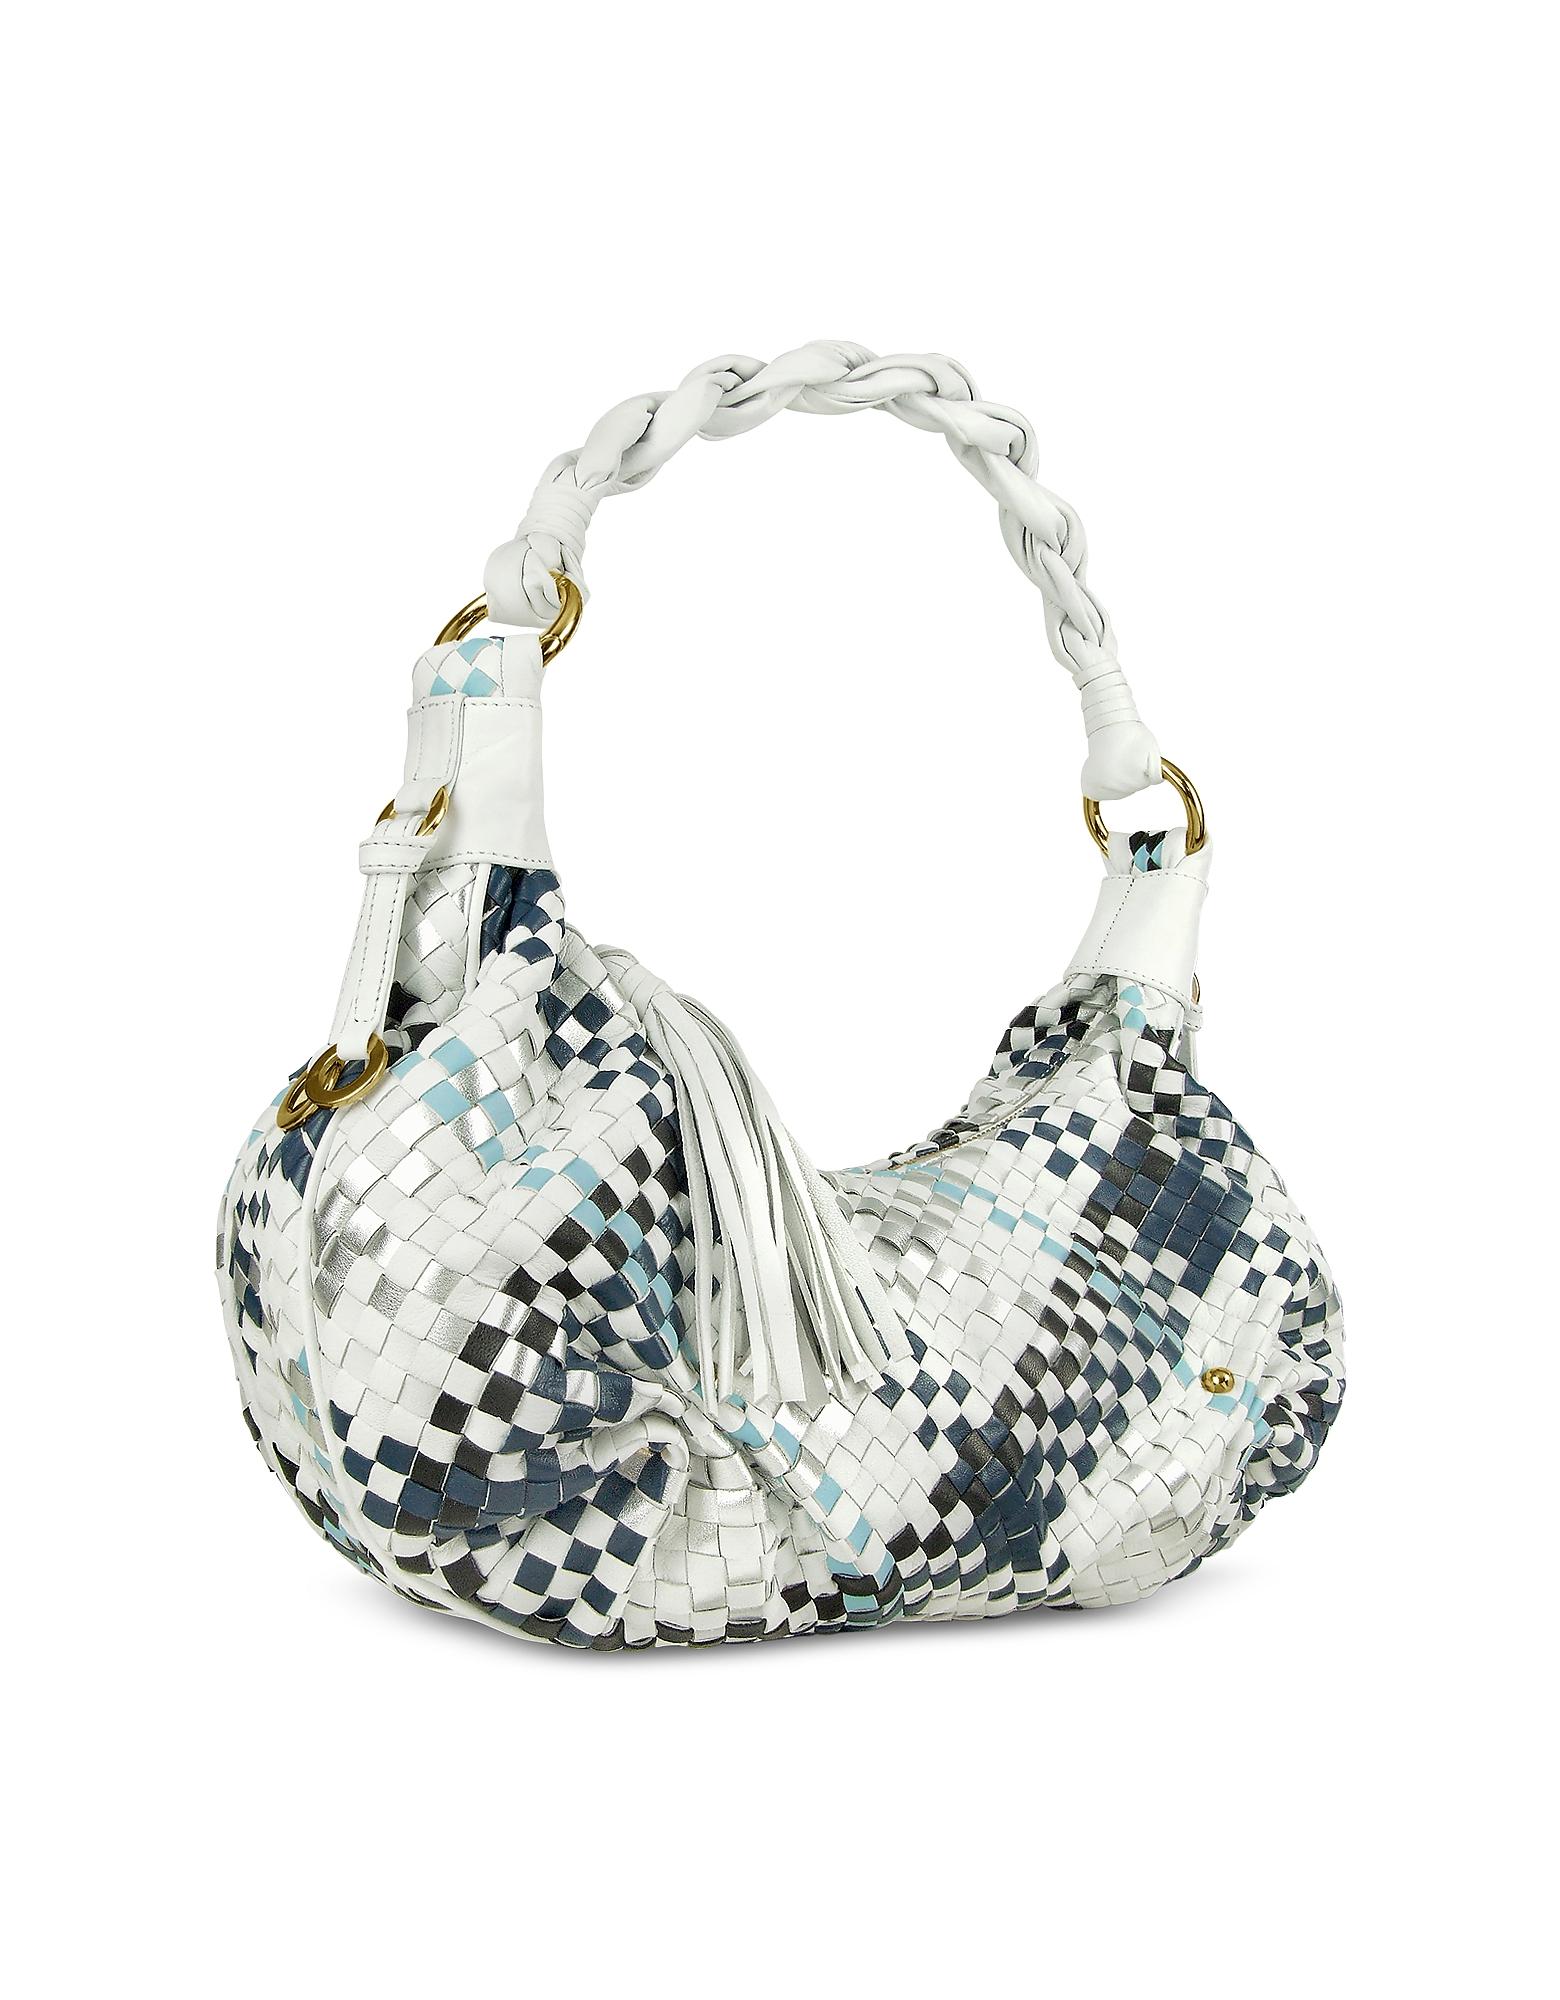 Fontanelli Handbags, Blue & White Woven Leather East/West Hobo Bag